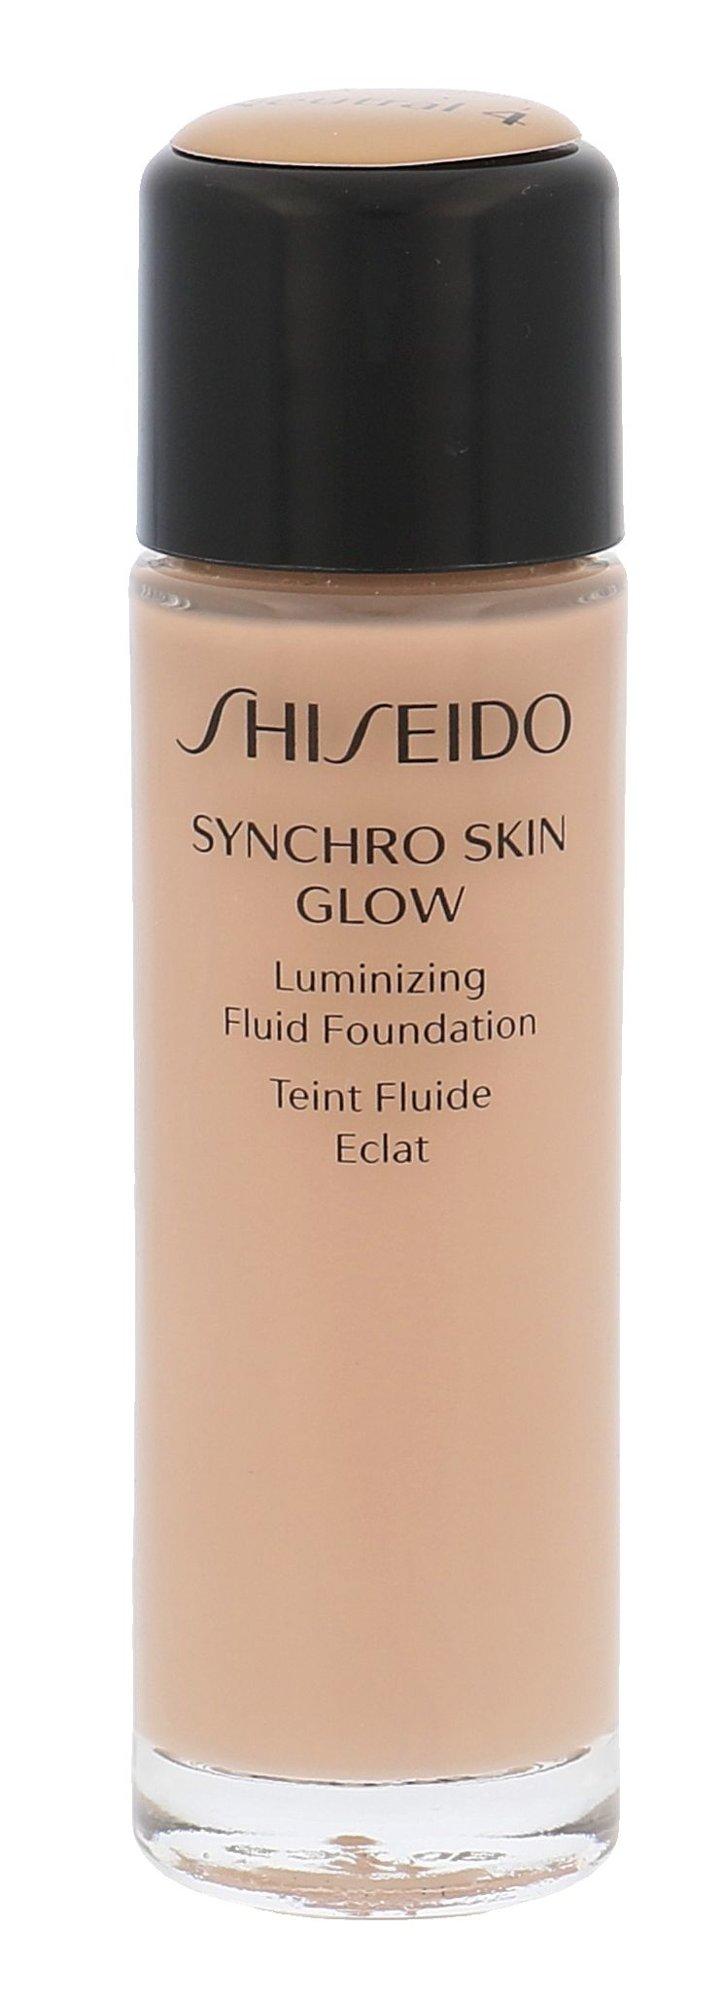 Shiseido Synchro Skin Glow Cosmetic 10ml Neutral 4